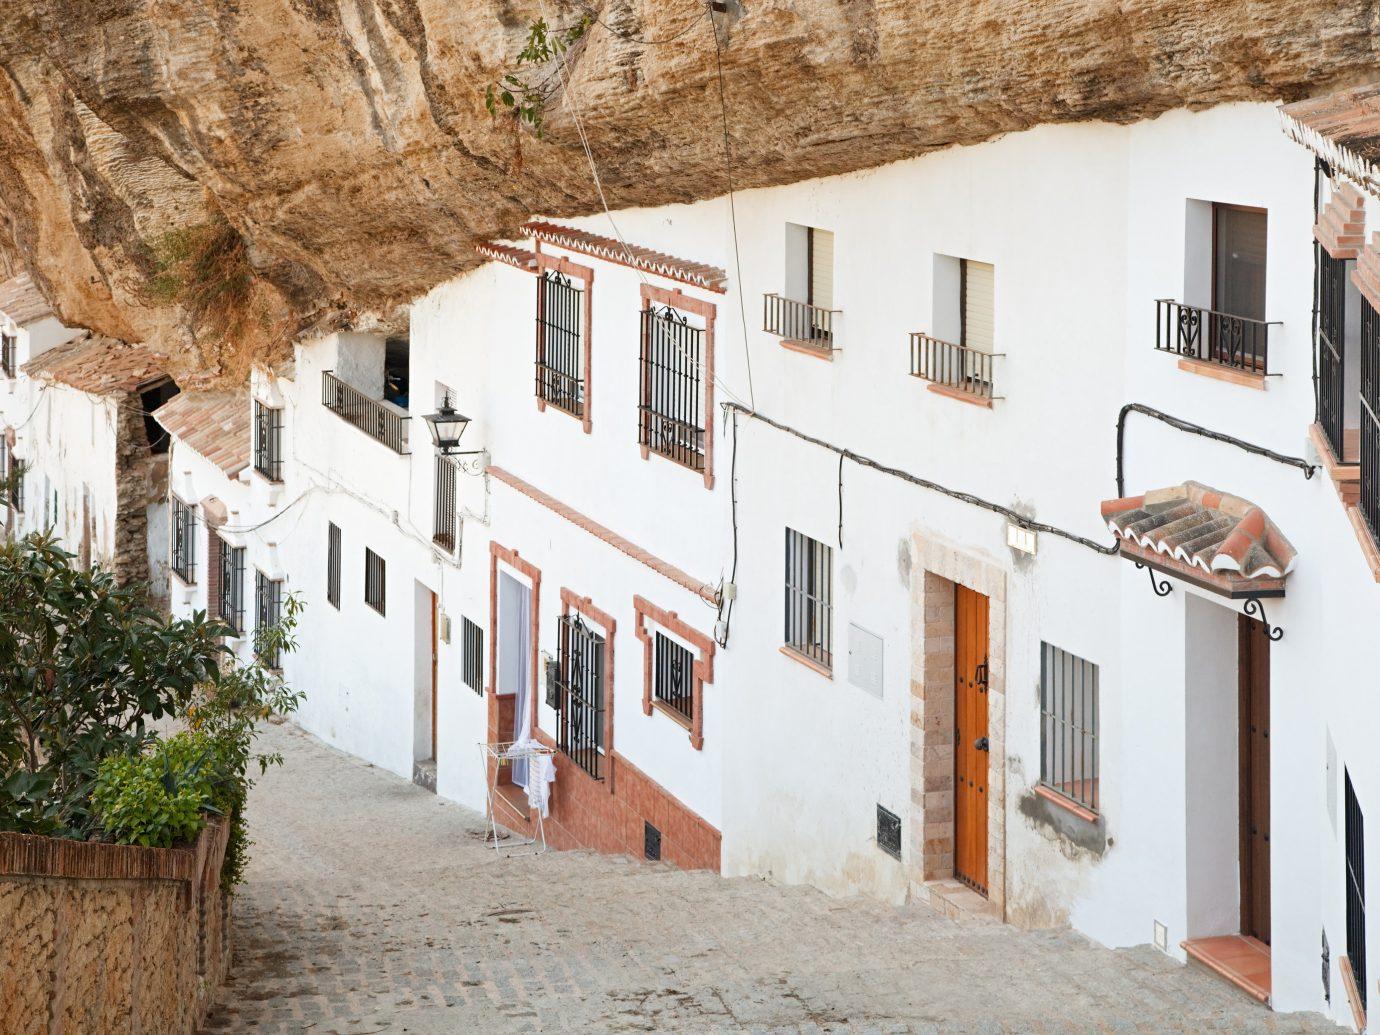 europe Spain Trip Ideas Town neighbourhood house alley window facade sky building street tourism Village